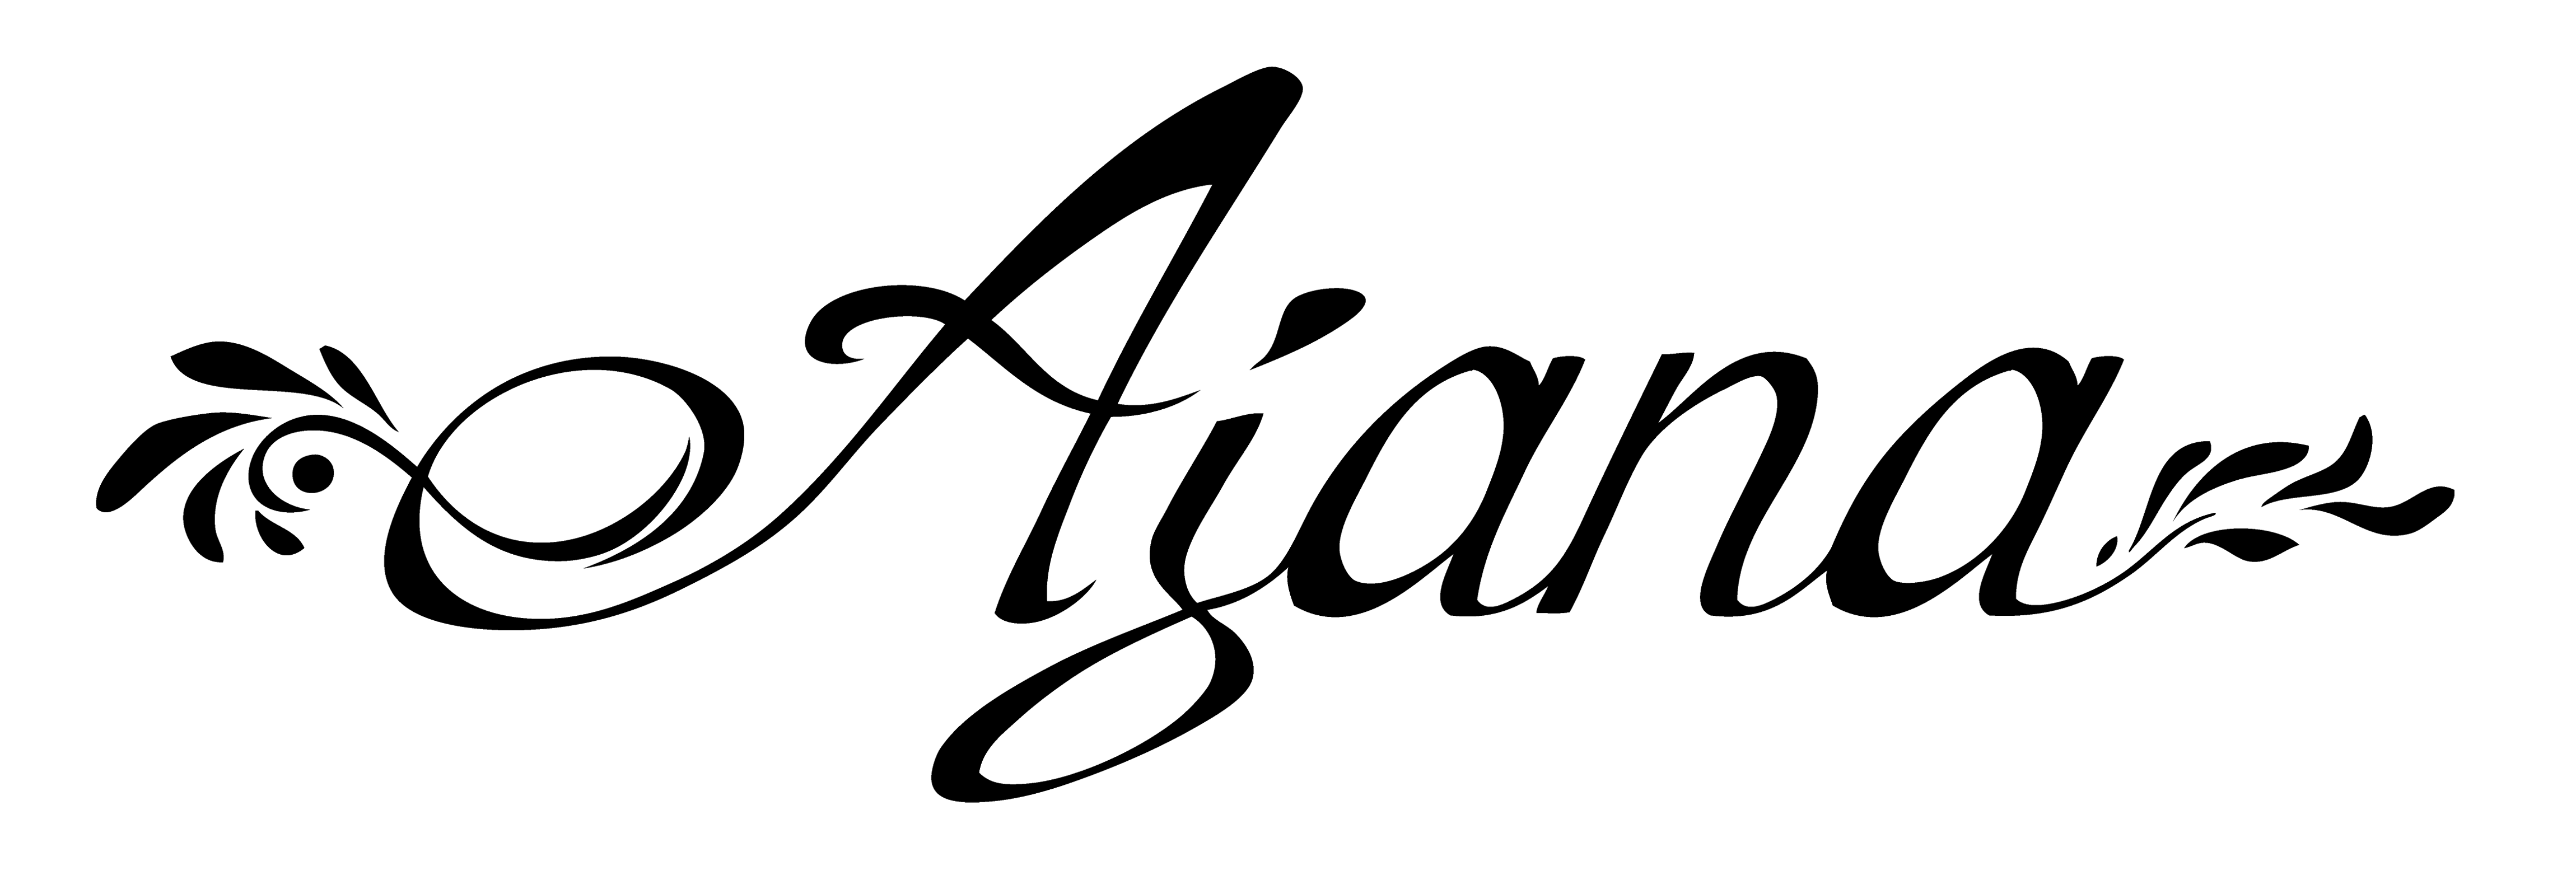 ajana-logo-hd-transparent-simple